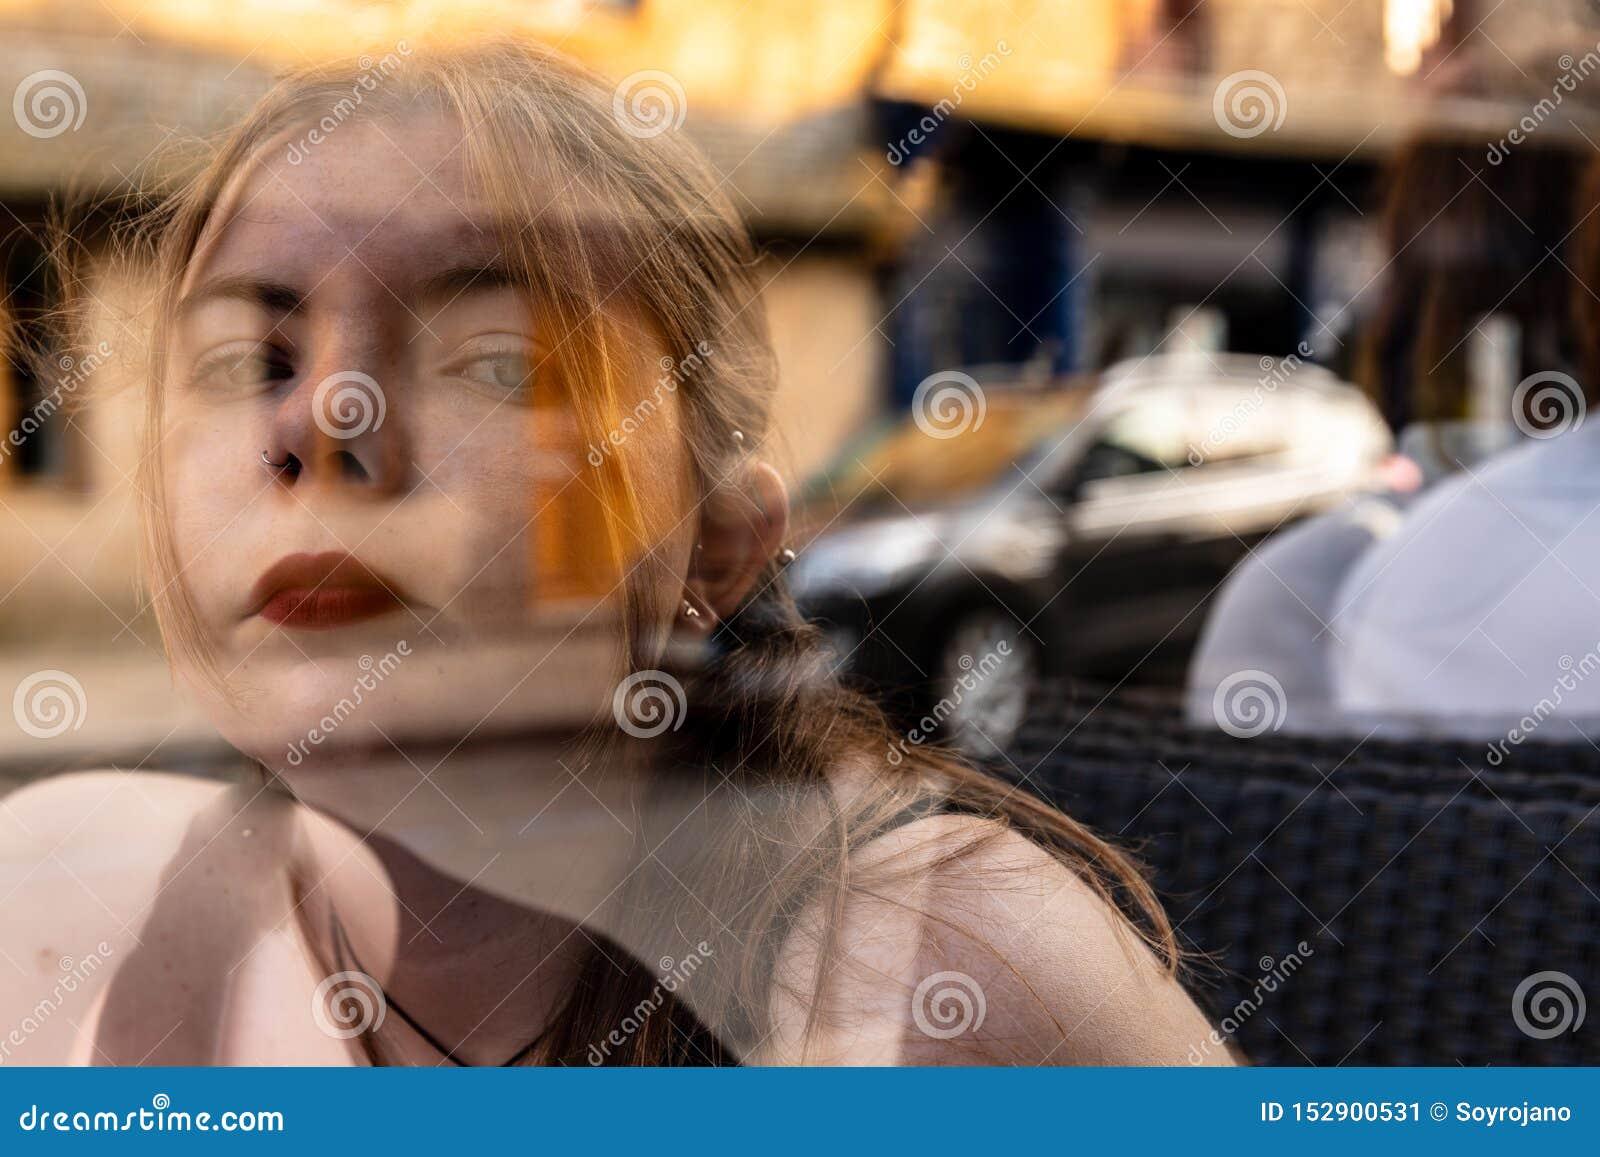 Transparent girl Surrealist scene double exposure